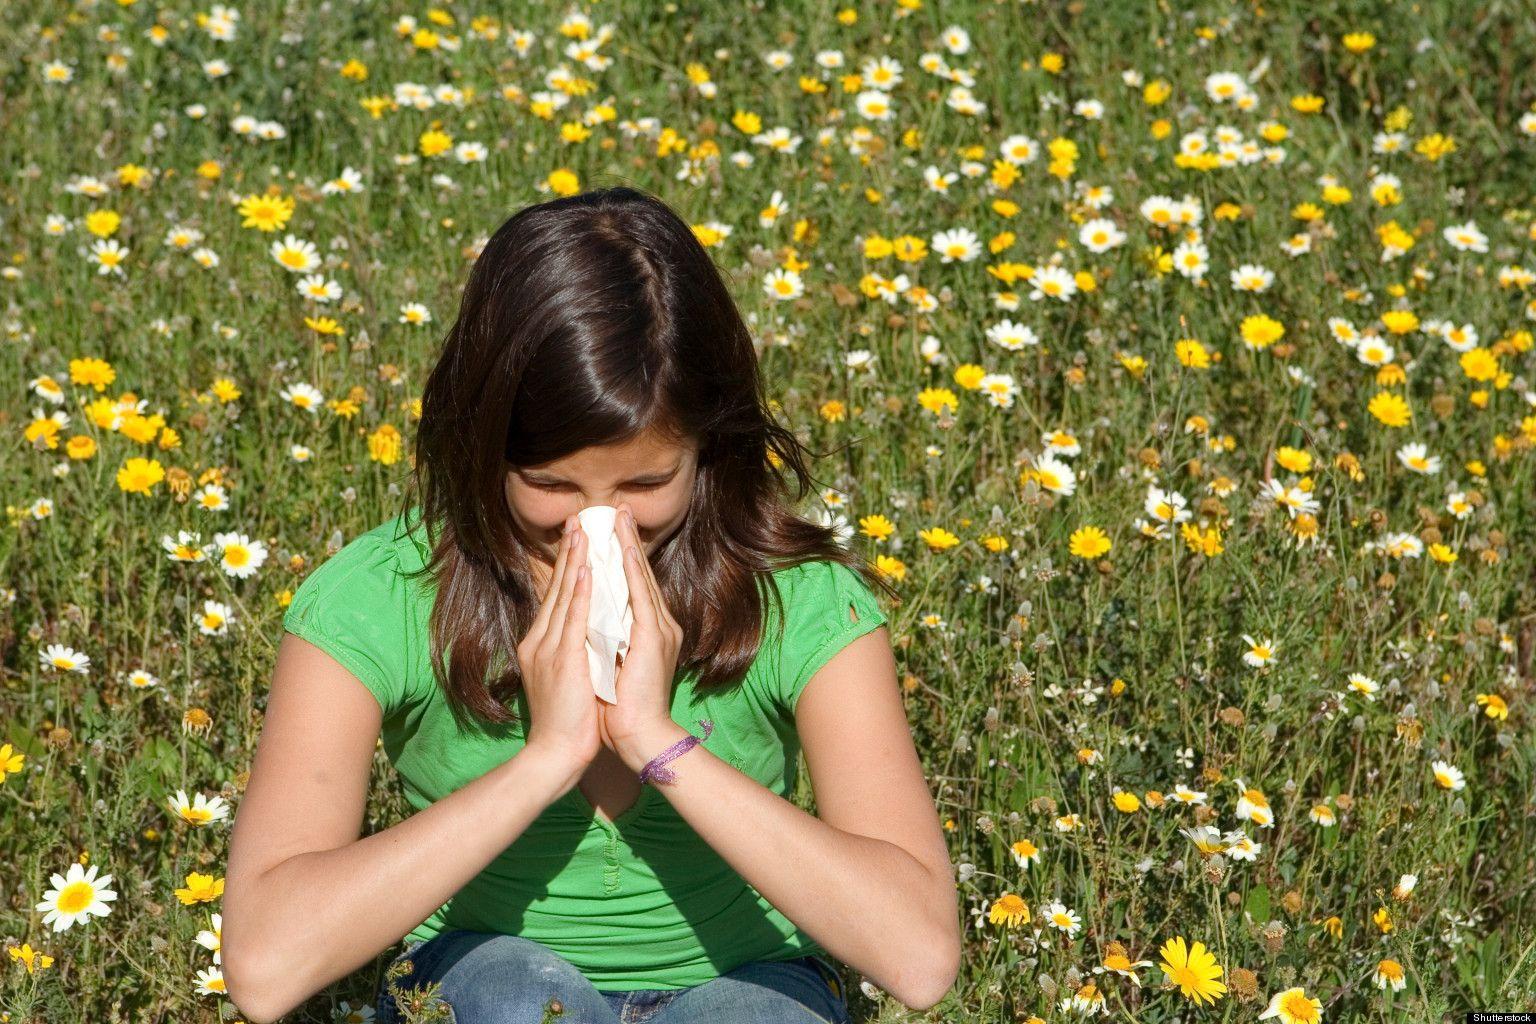 #Alersense - http://www.alersense.com/tips-for-surviving-spring-allergy-season/